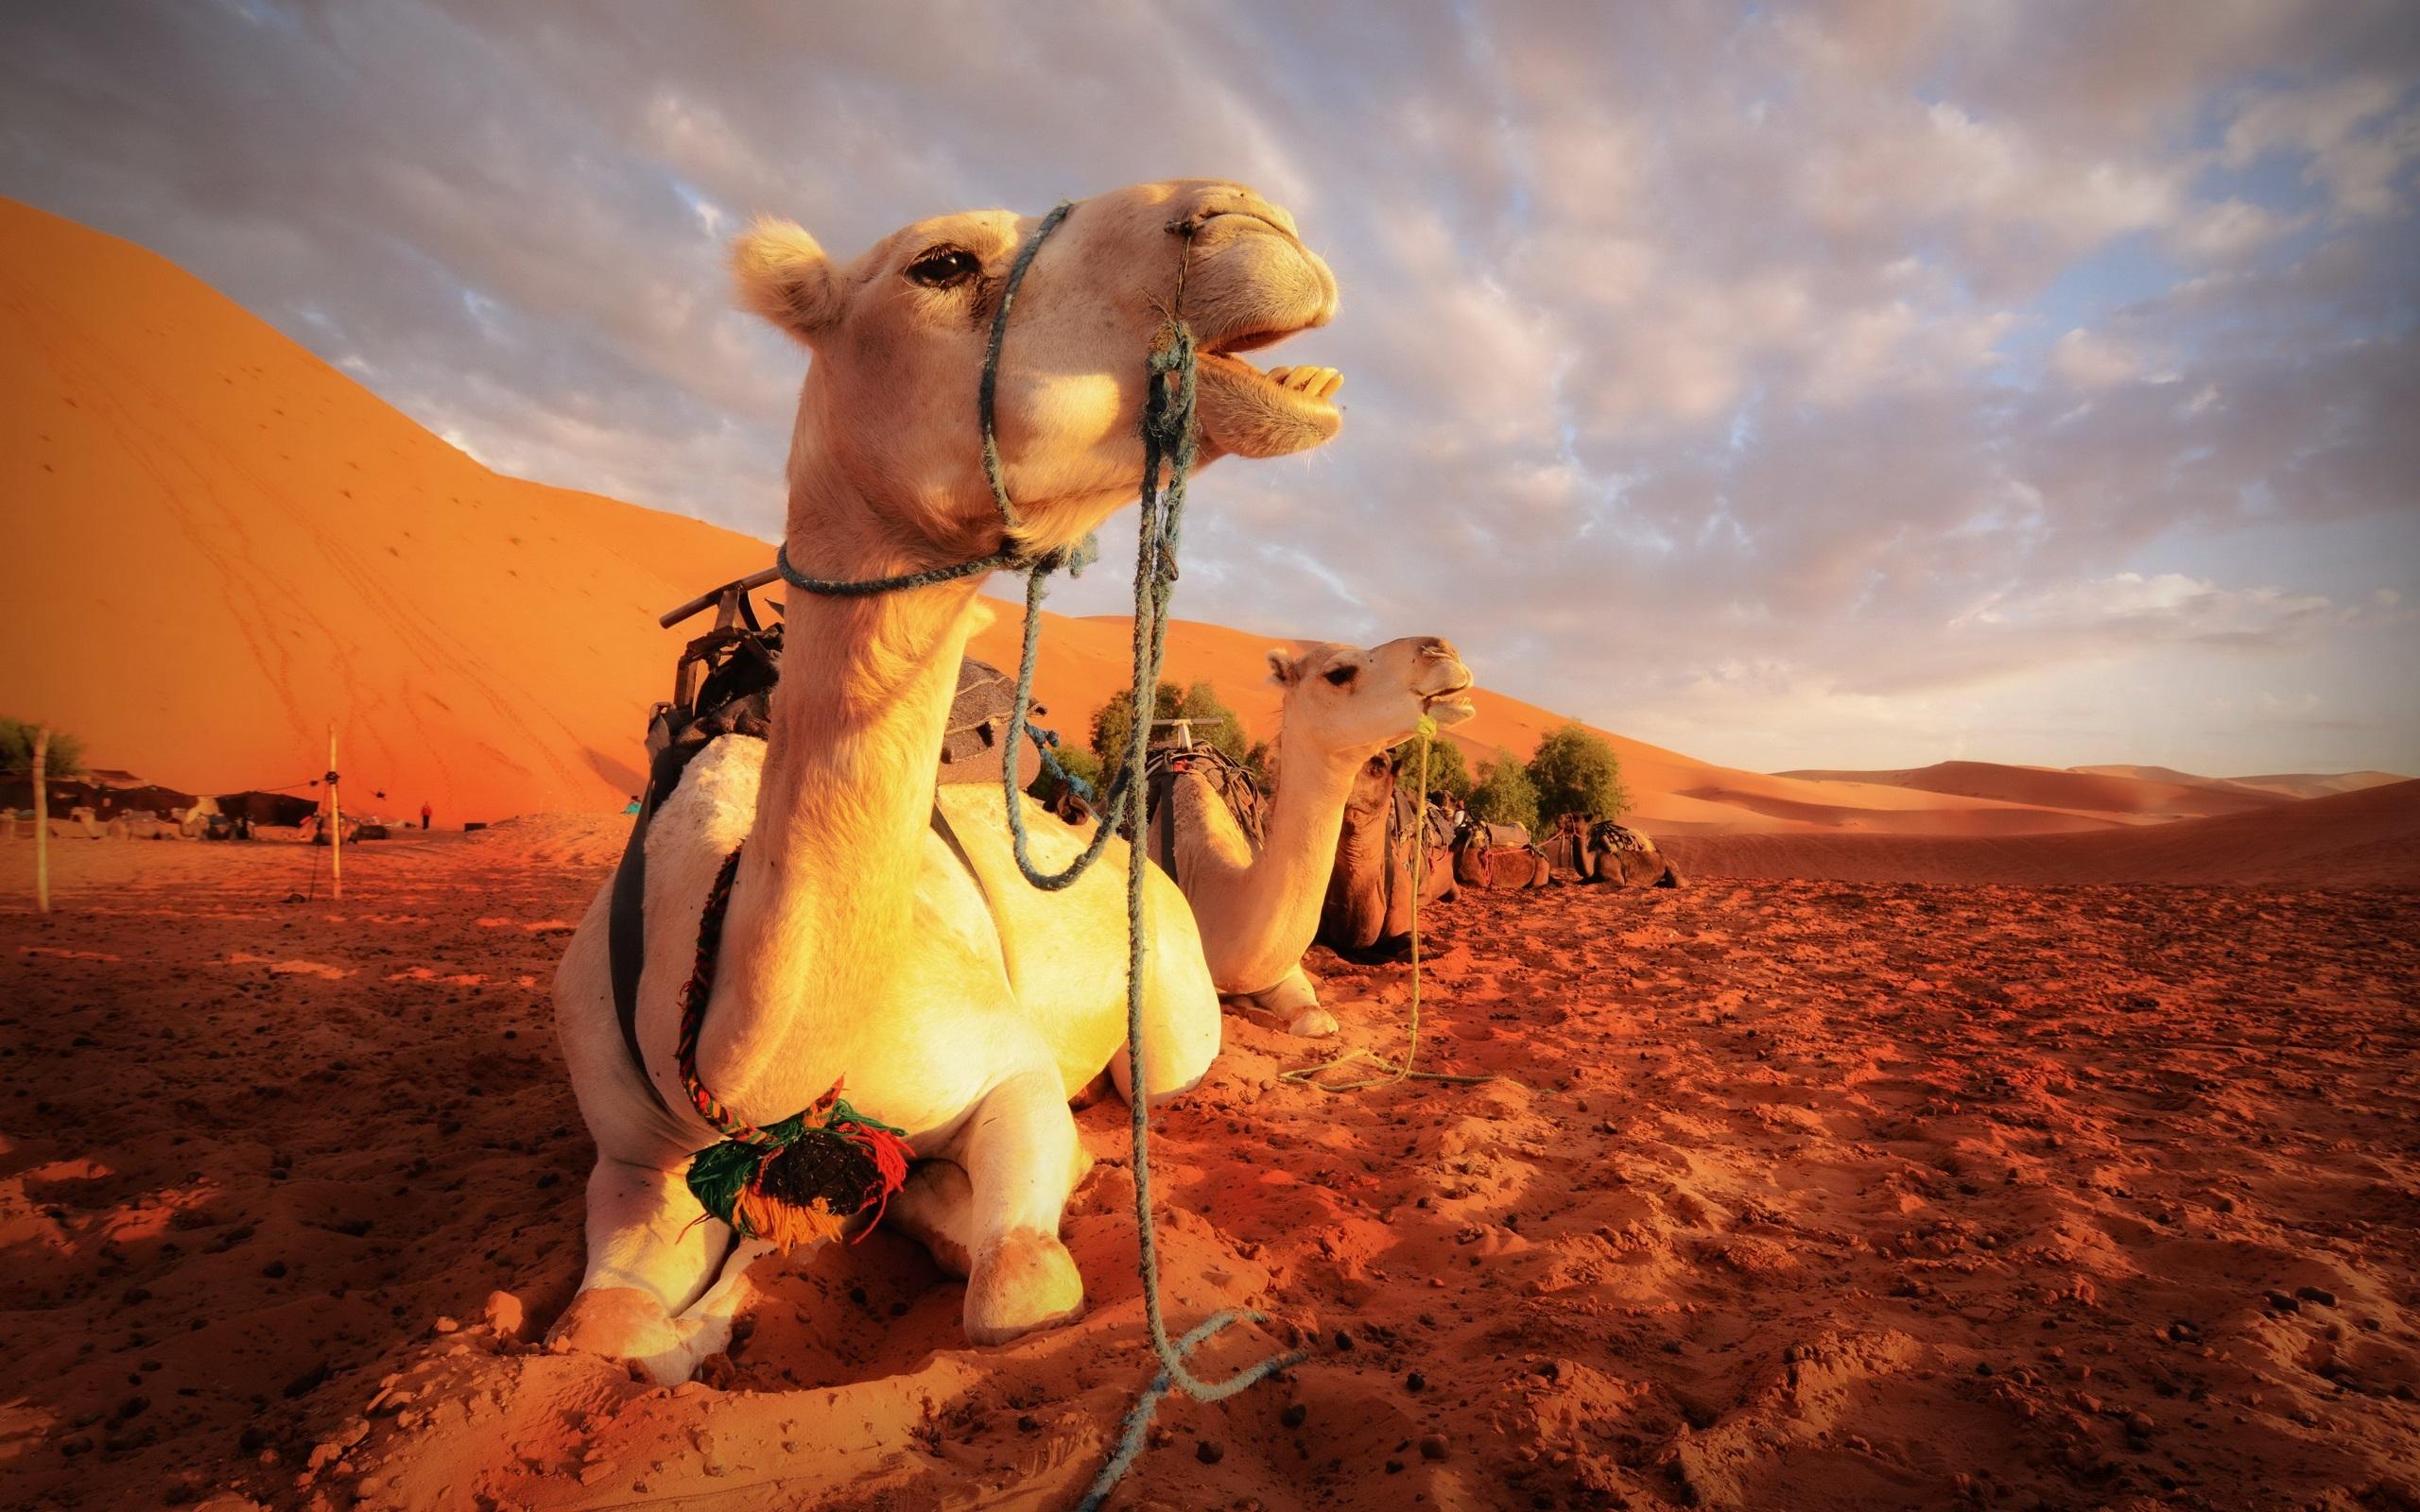 Wallpaper Camels Rest Desert 2560x1600 Hd Picture Image